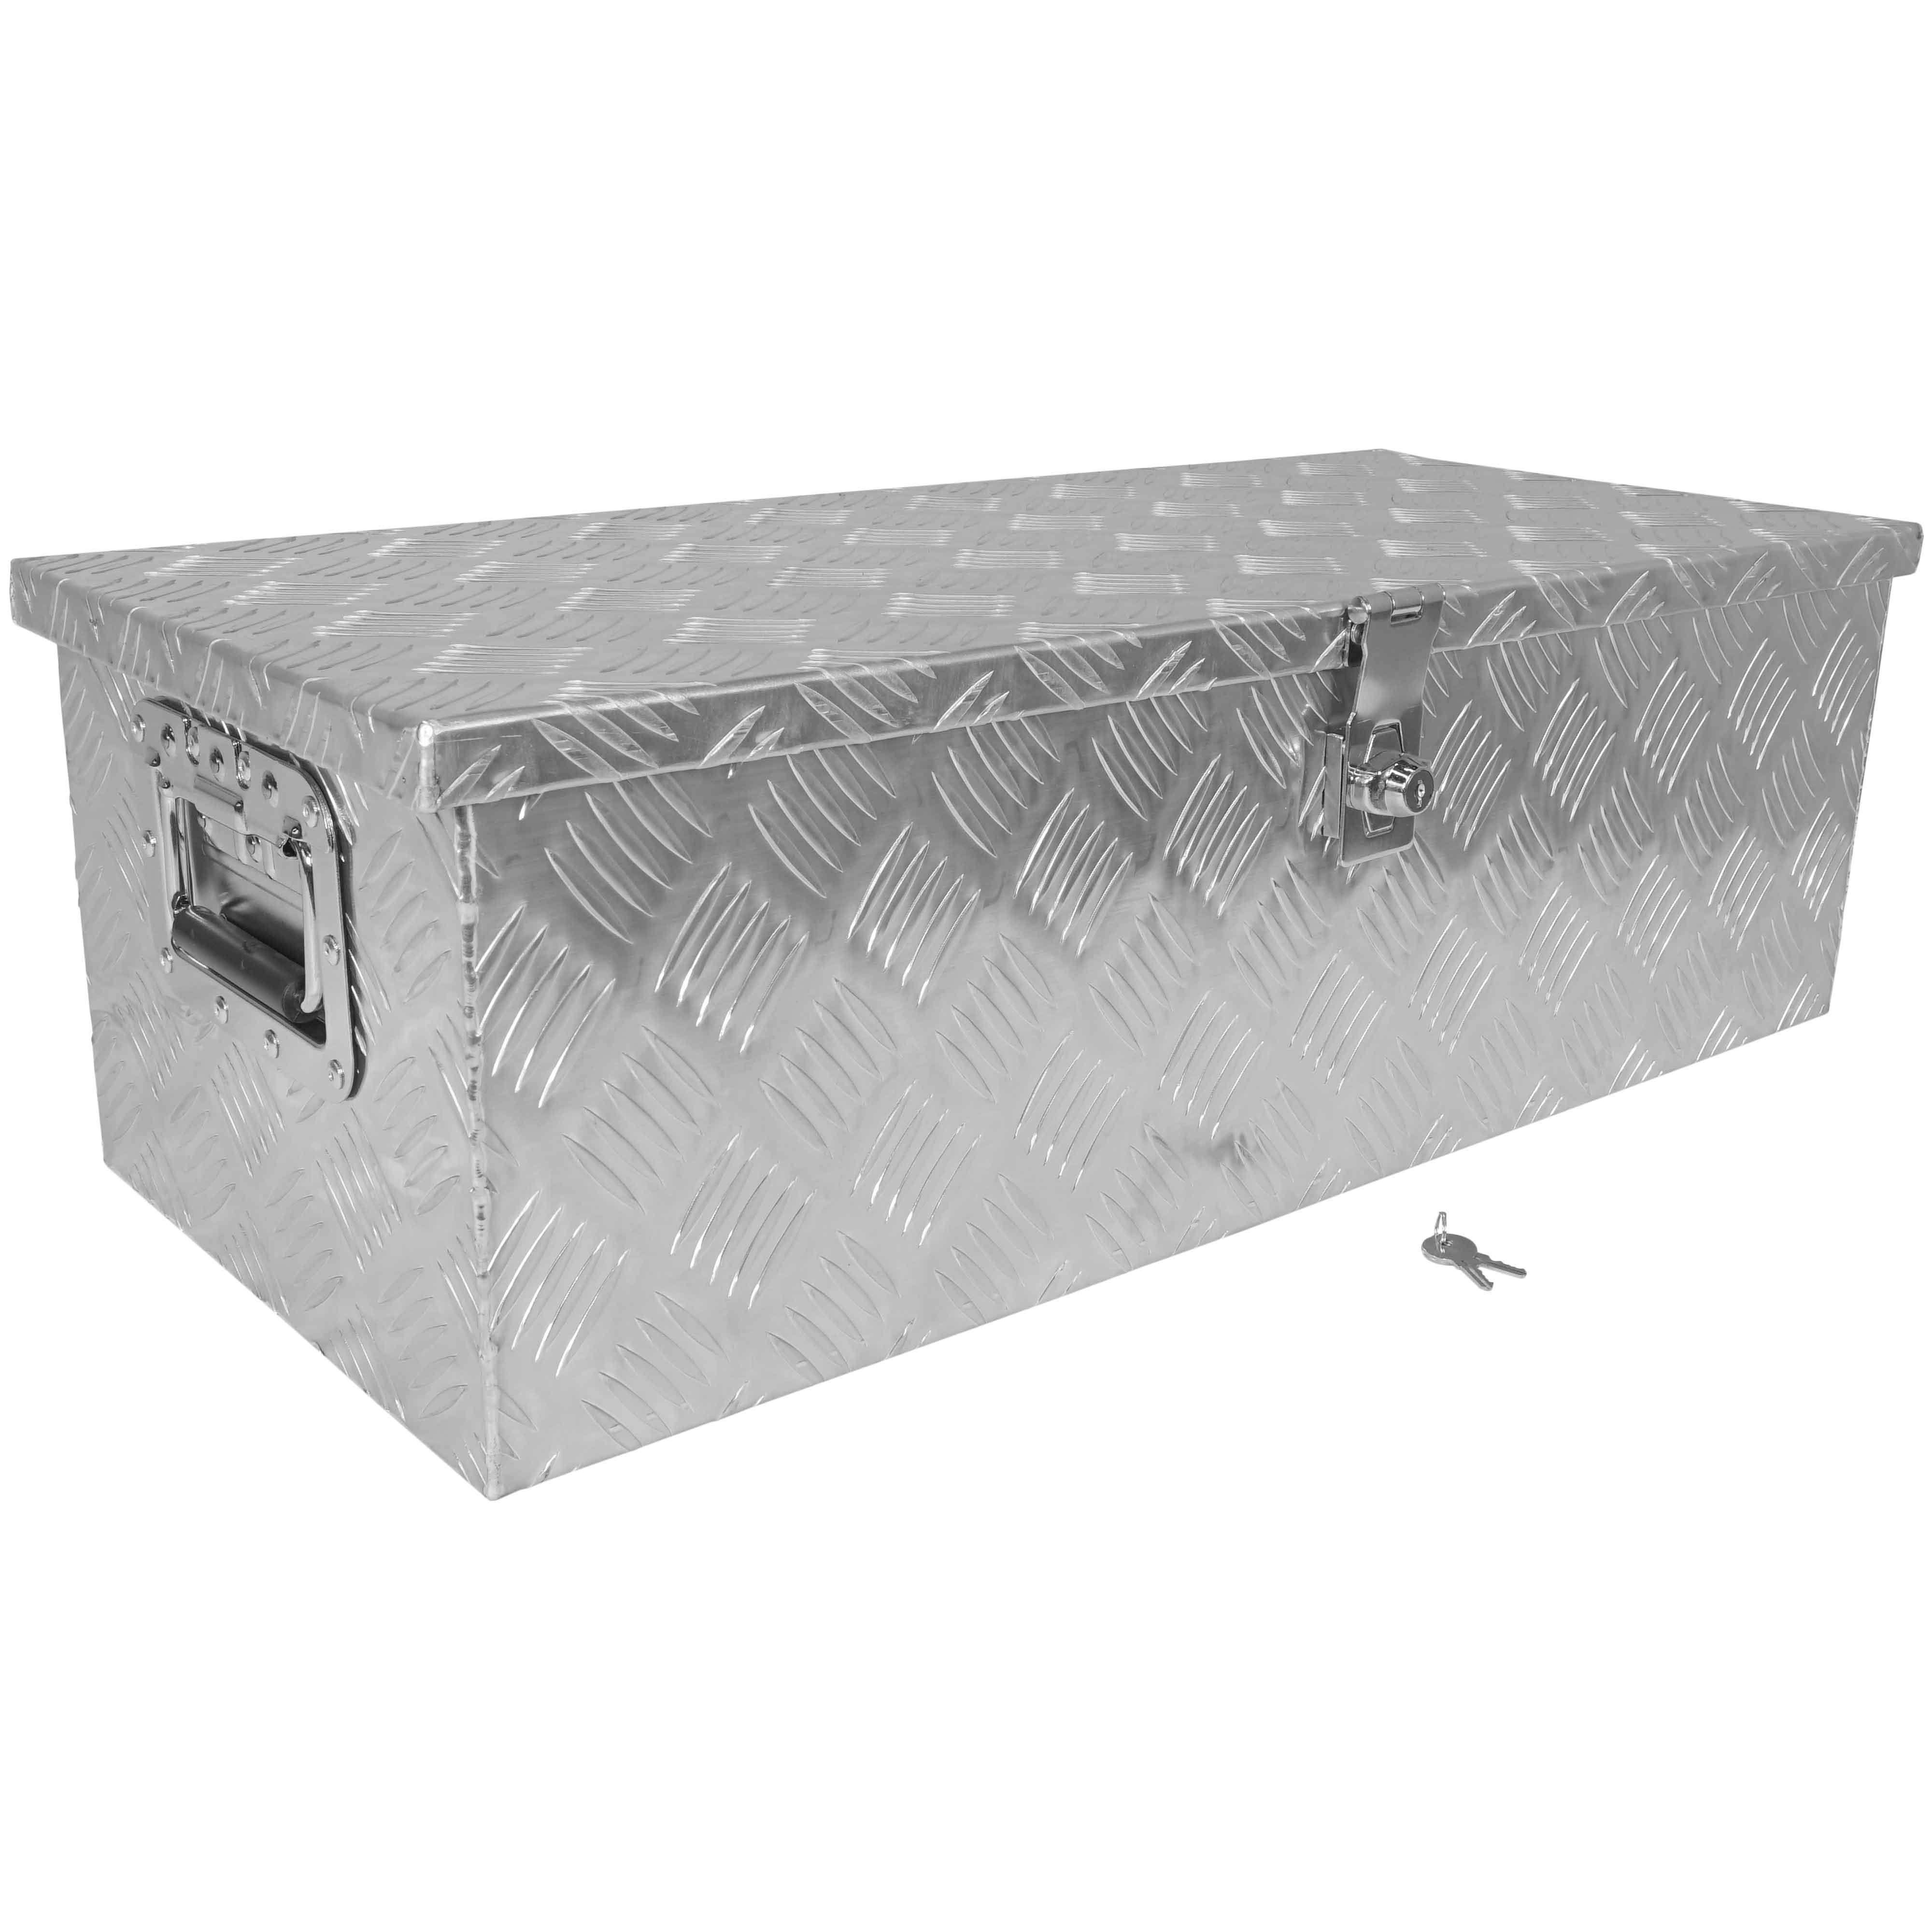 "titan 30"" aluminum truck bed camper tool box w/ lock pickup"